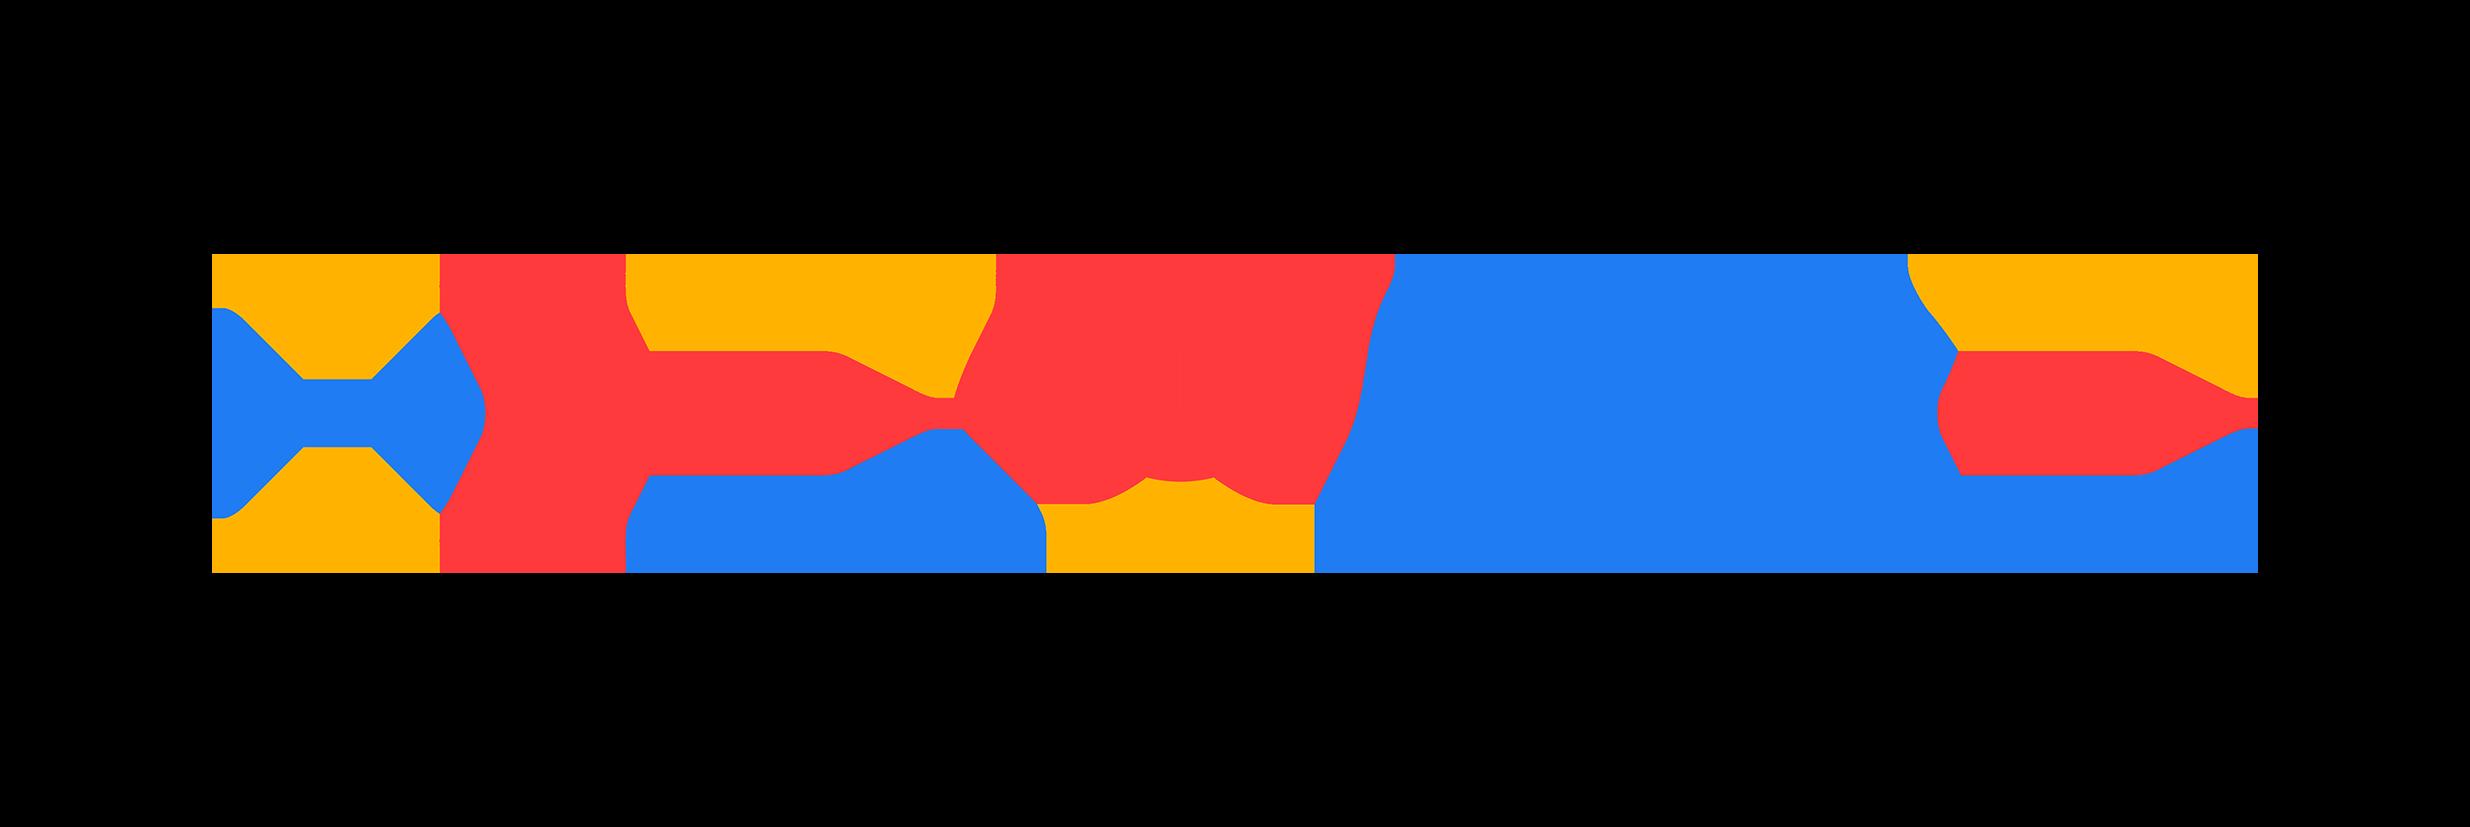 Heyme - Assurance des étudiants